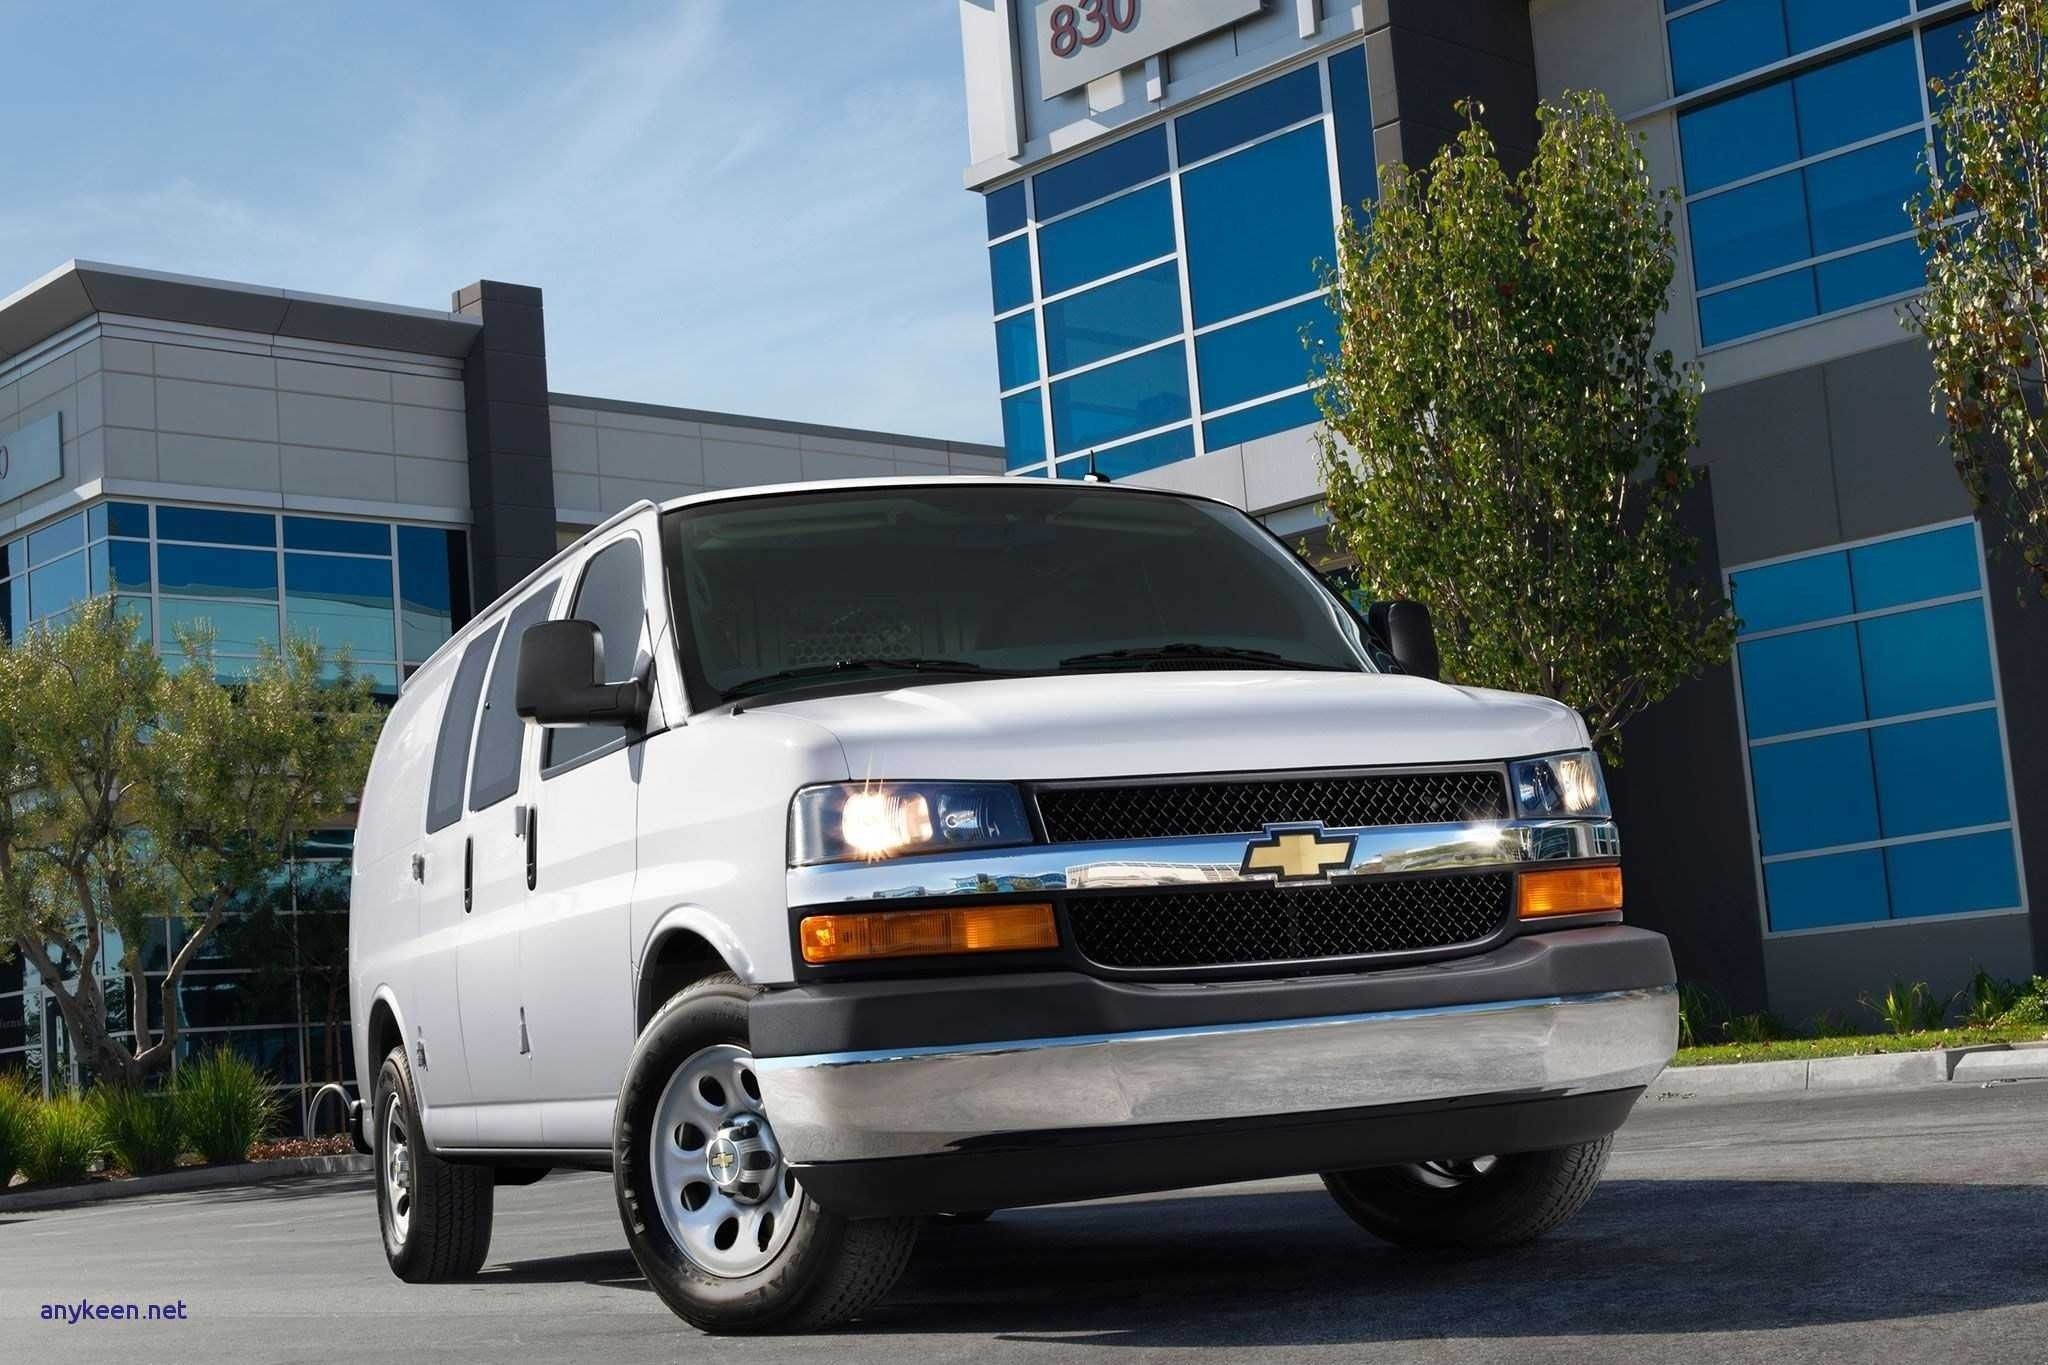 medium resolution of 2019 chevy express passenger van first drive car review 2018